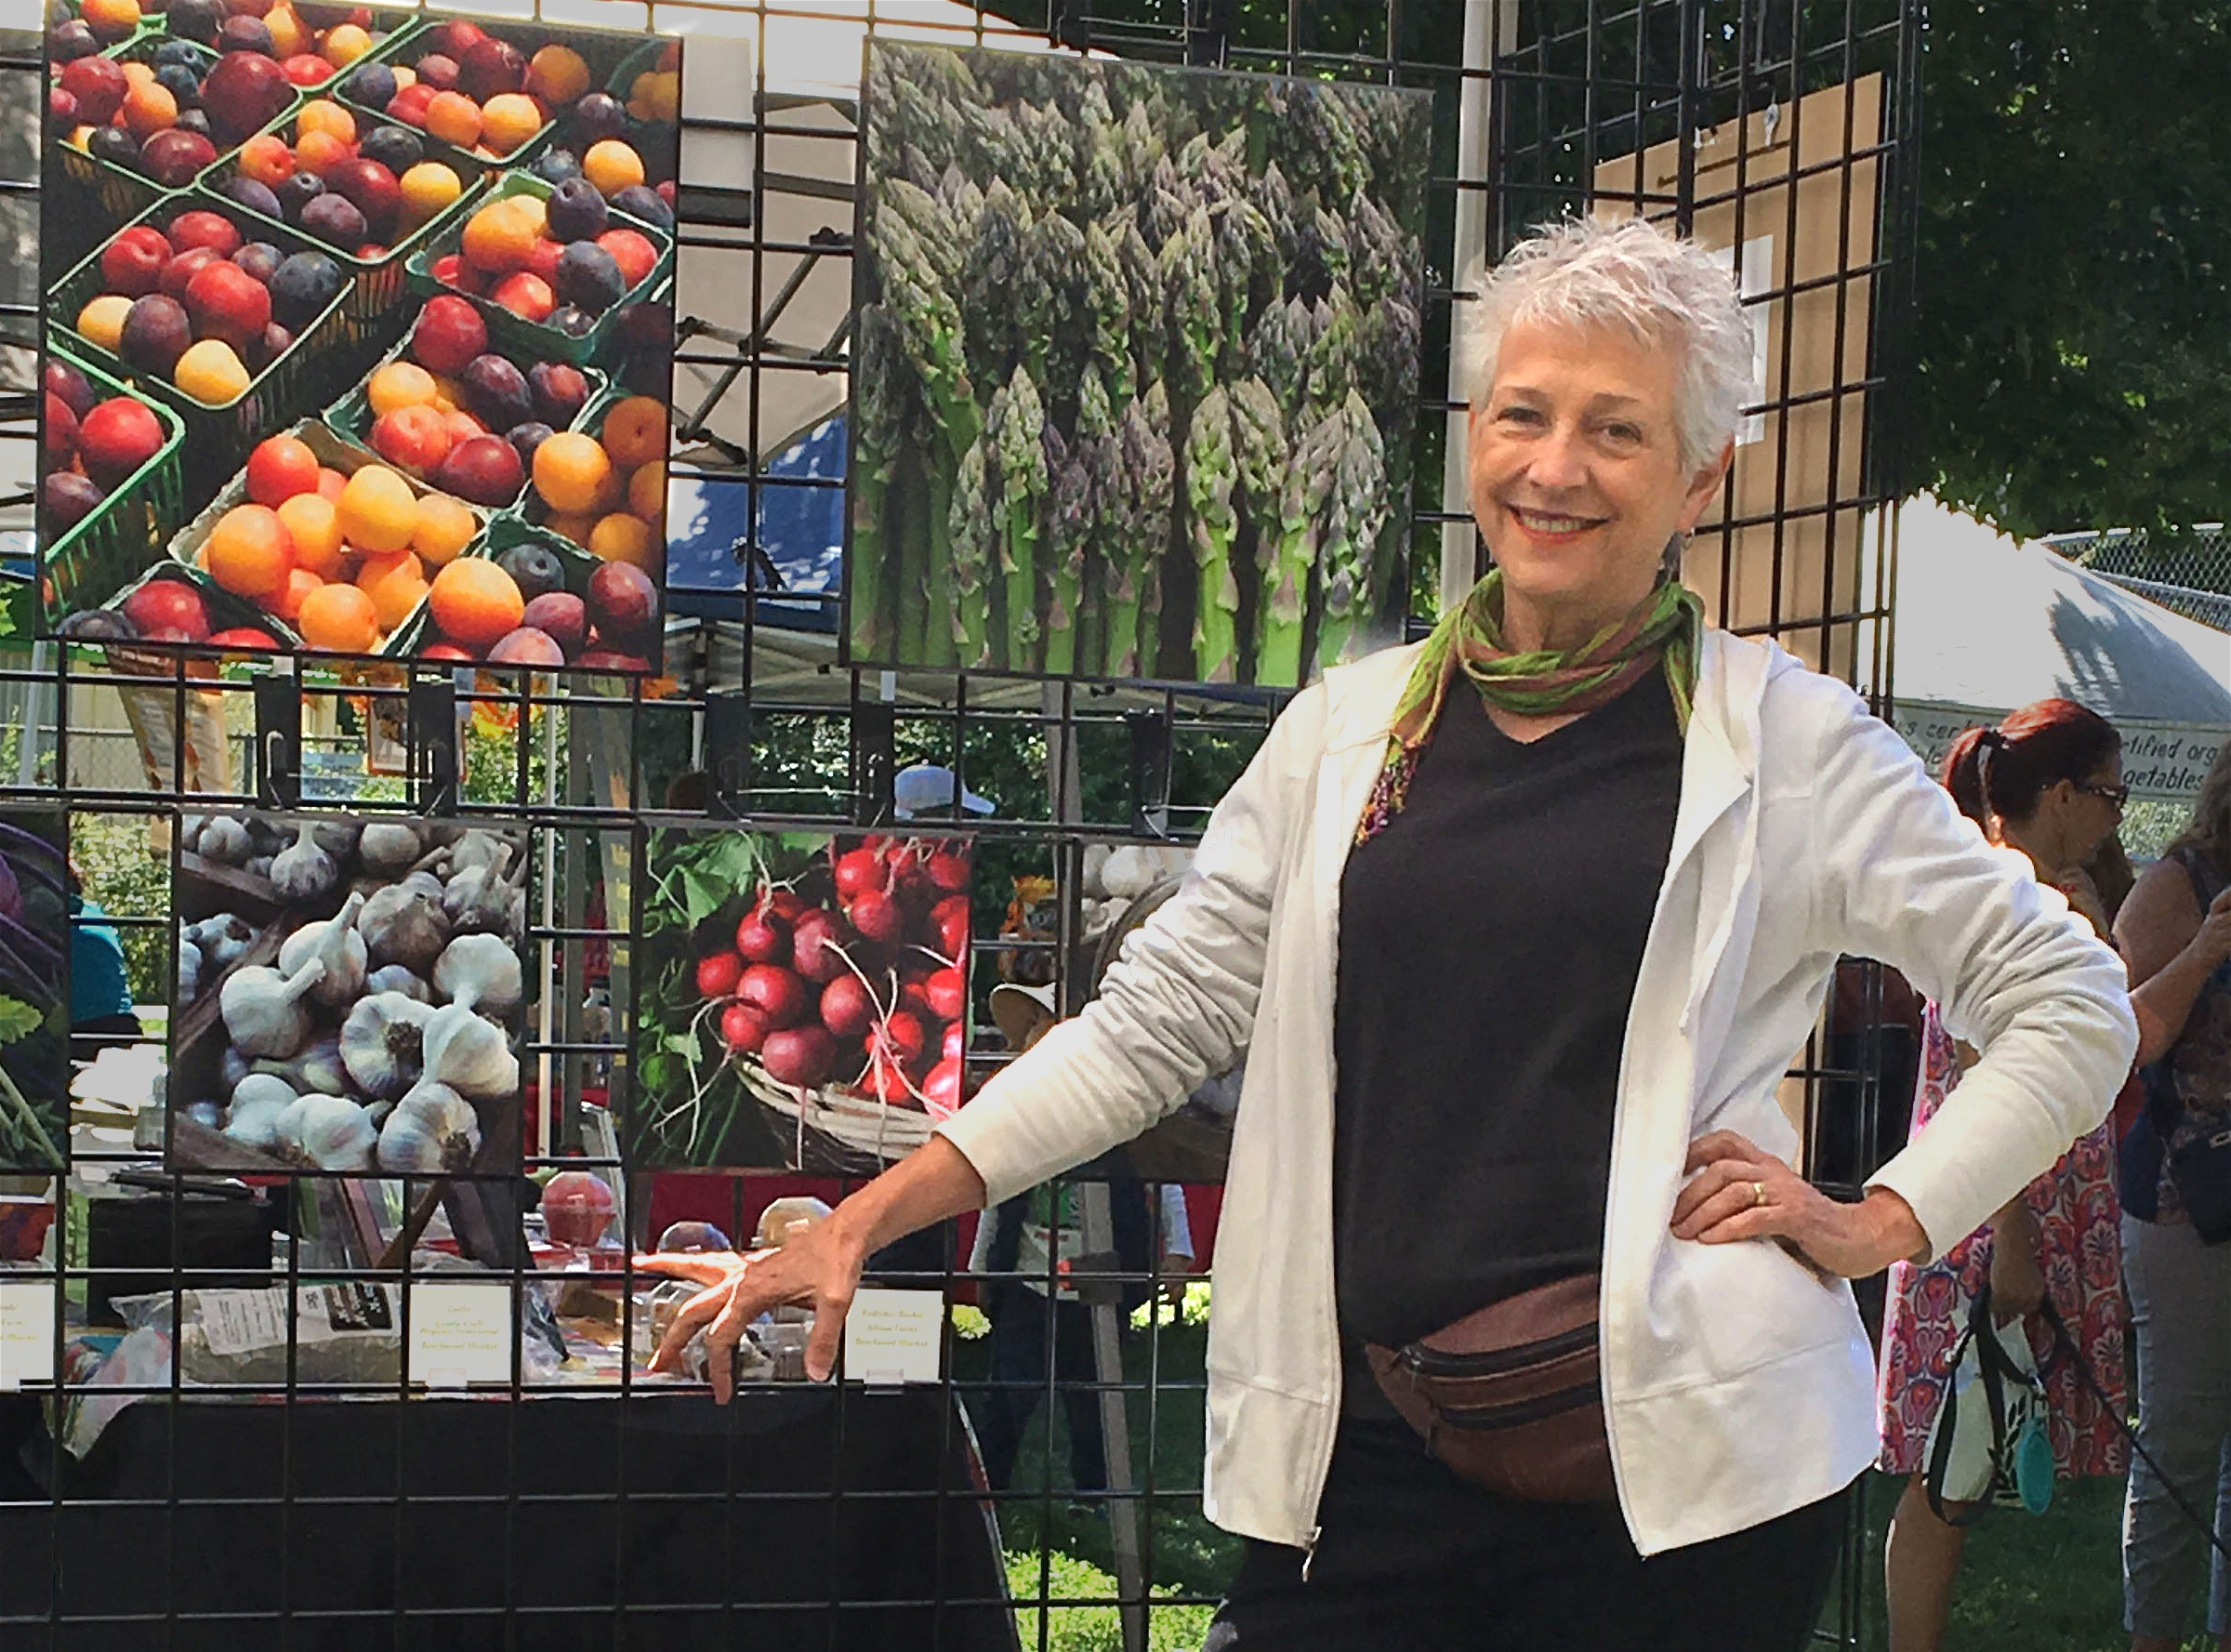 Irene Tobis - PhotographerCommitted to healthier food & a joyful life